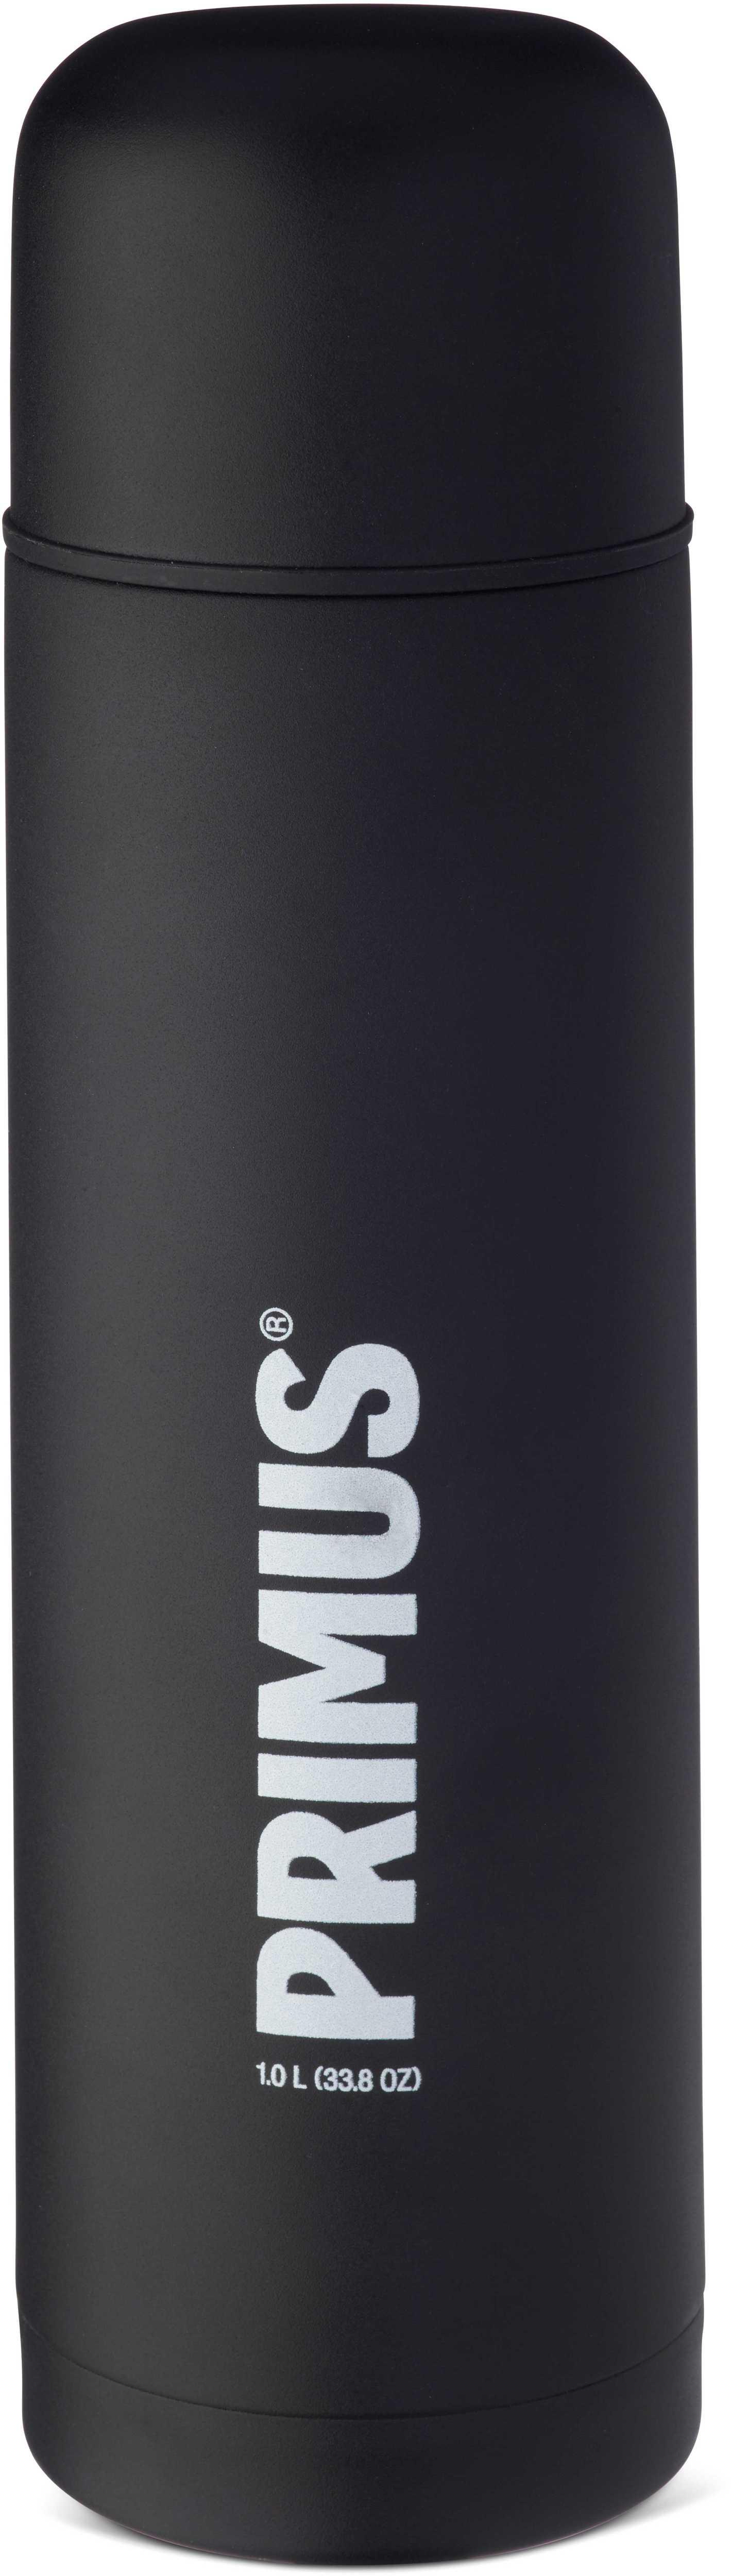 Termosflaska Primus Vacuum Bottle 1000 mlsvart | Bottles